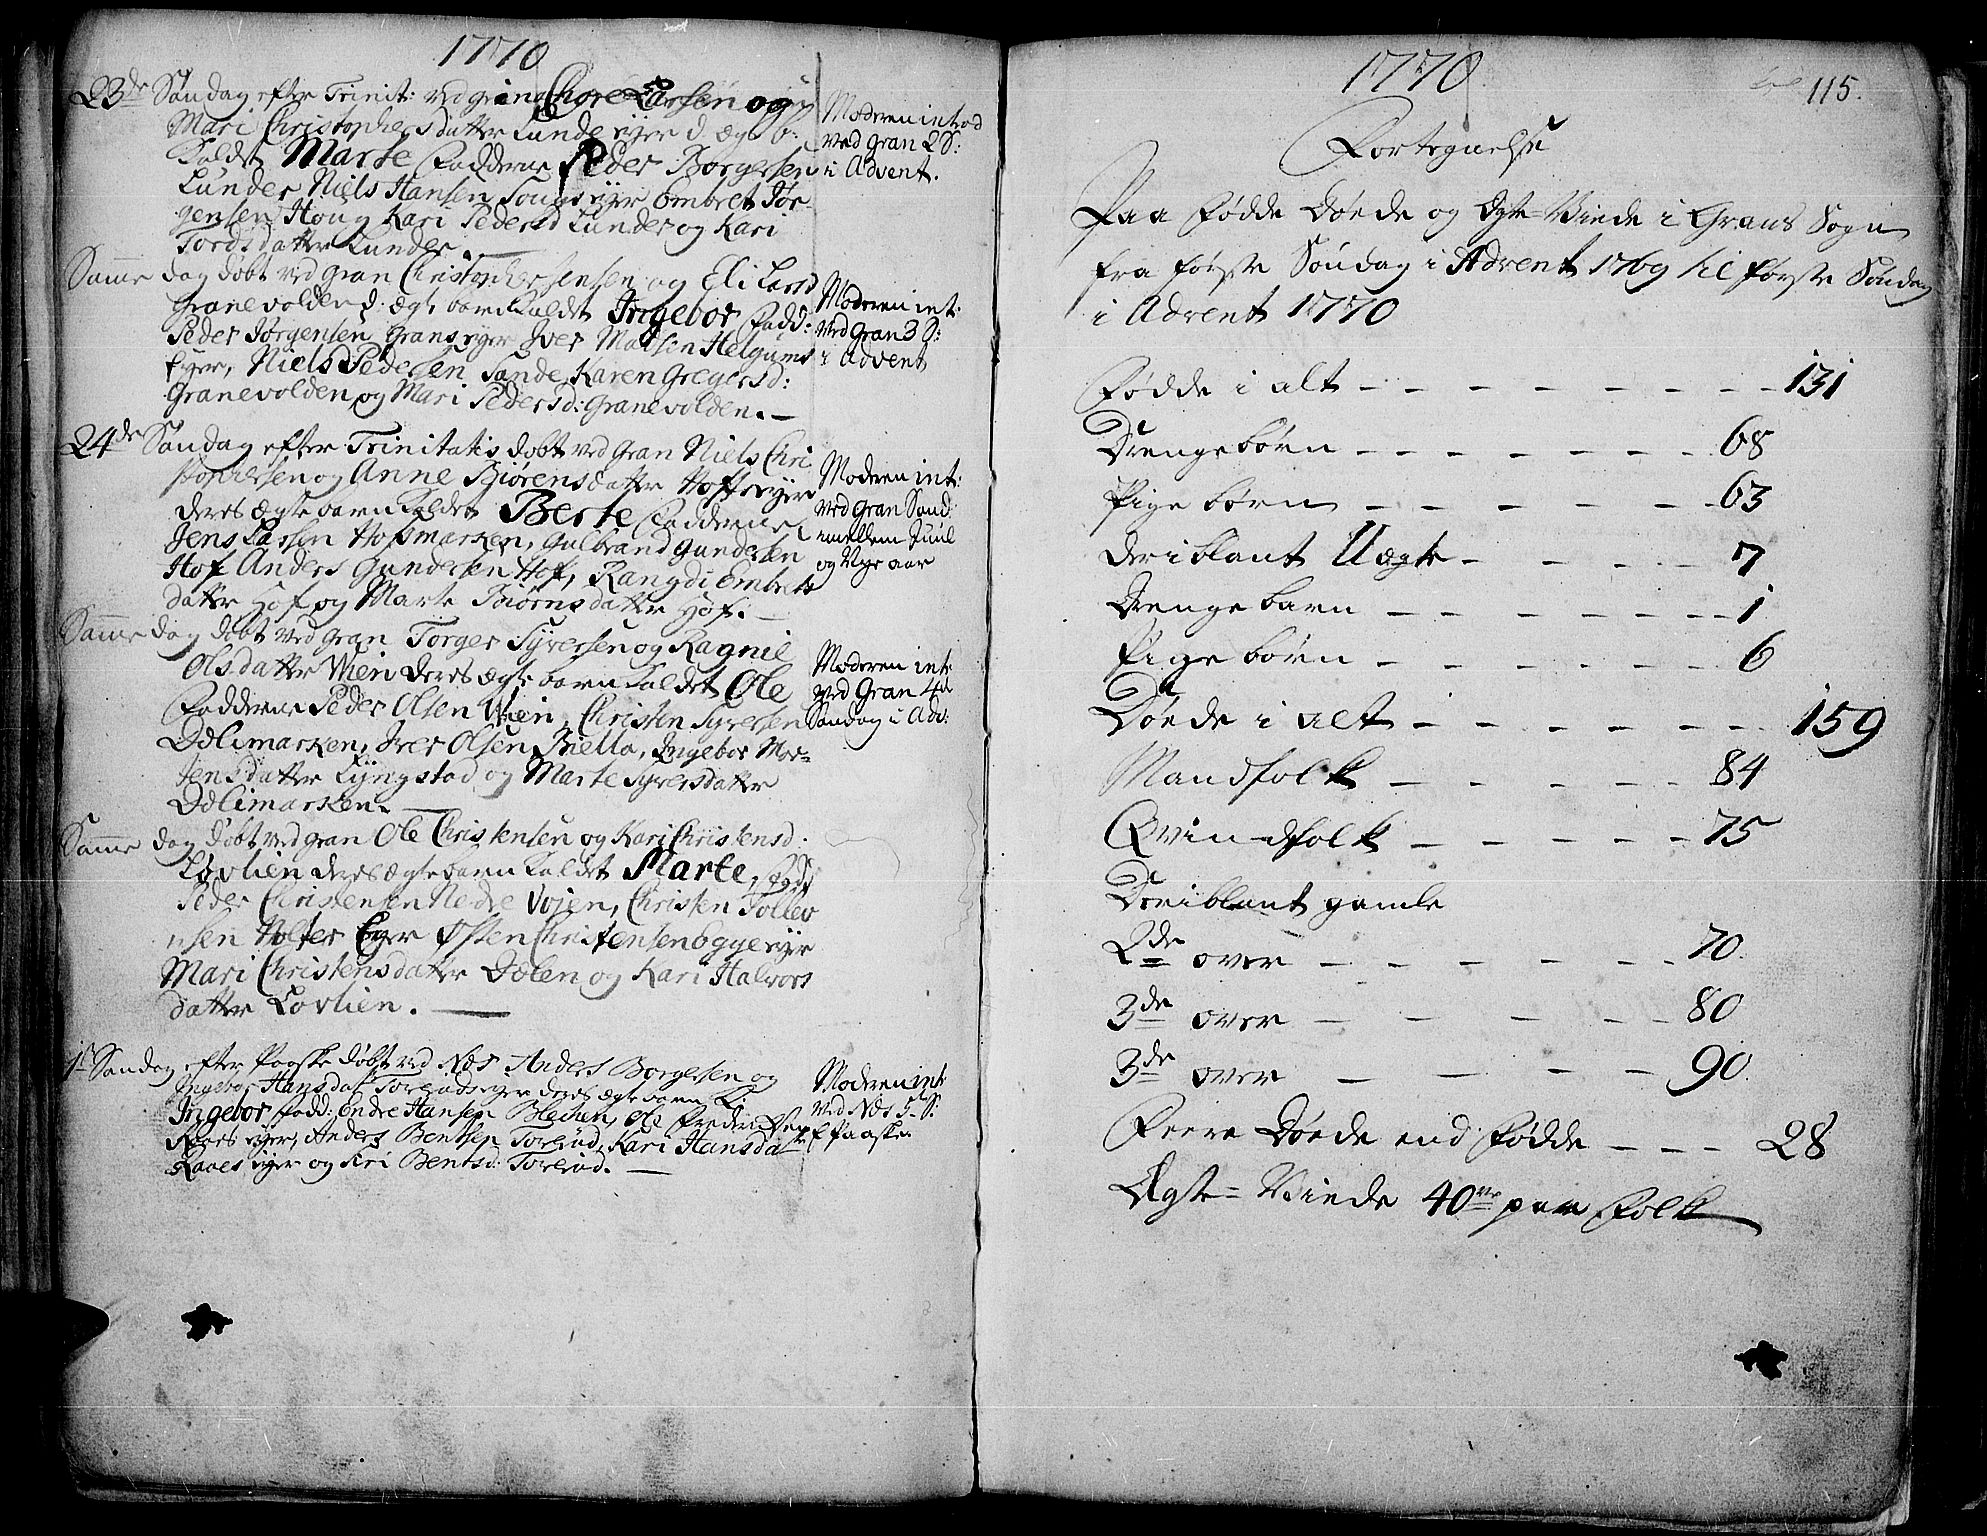 SAH, Gran prestekontor, Ministerialbok nr. 4, 1759-1775, s. 115